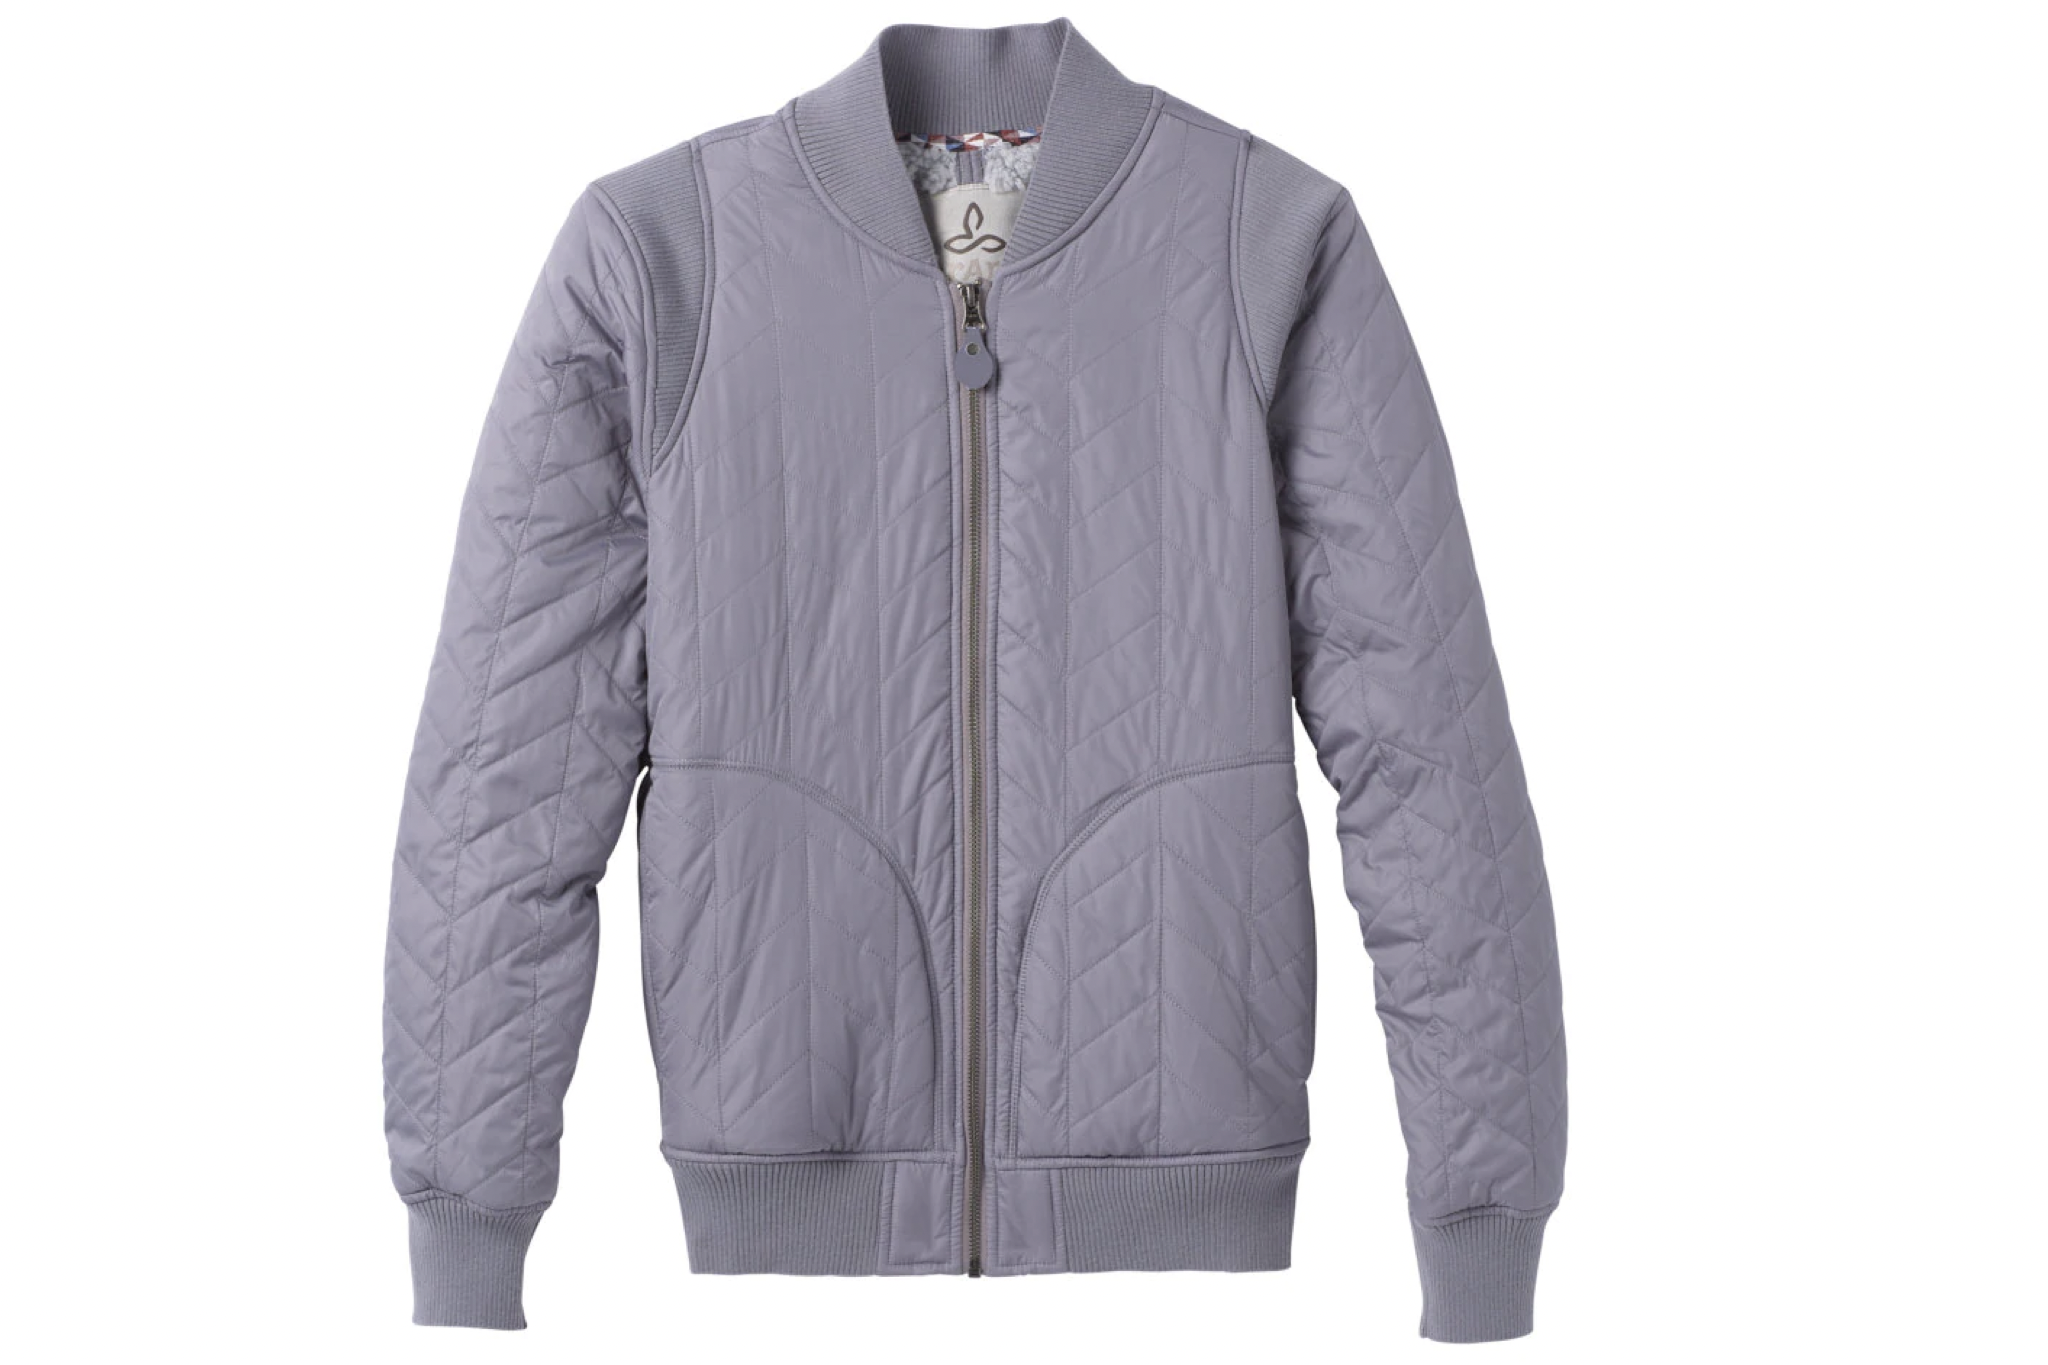 prAna women's varsity jacket